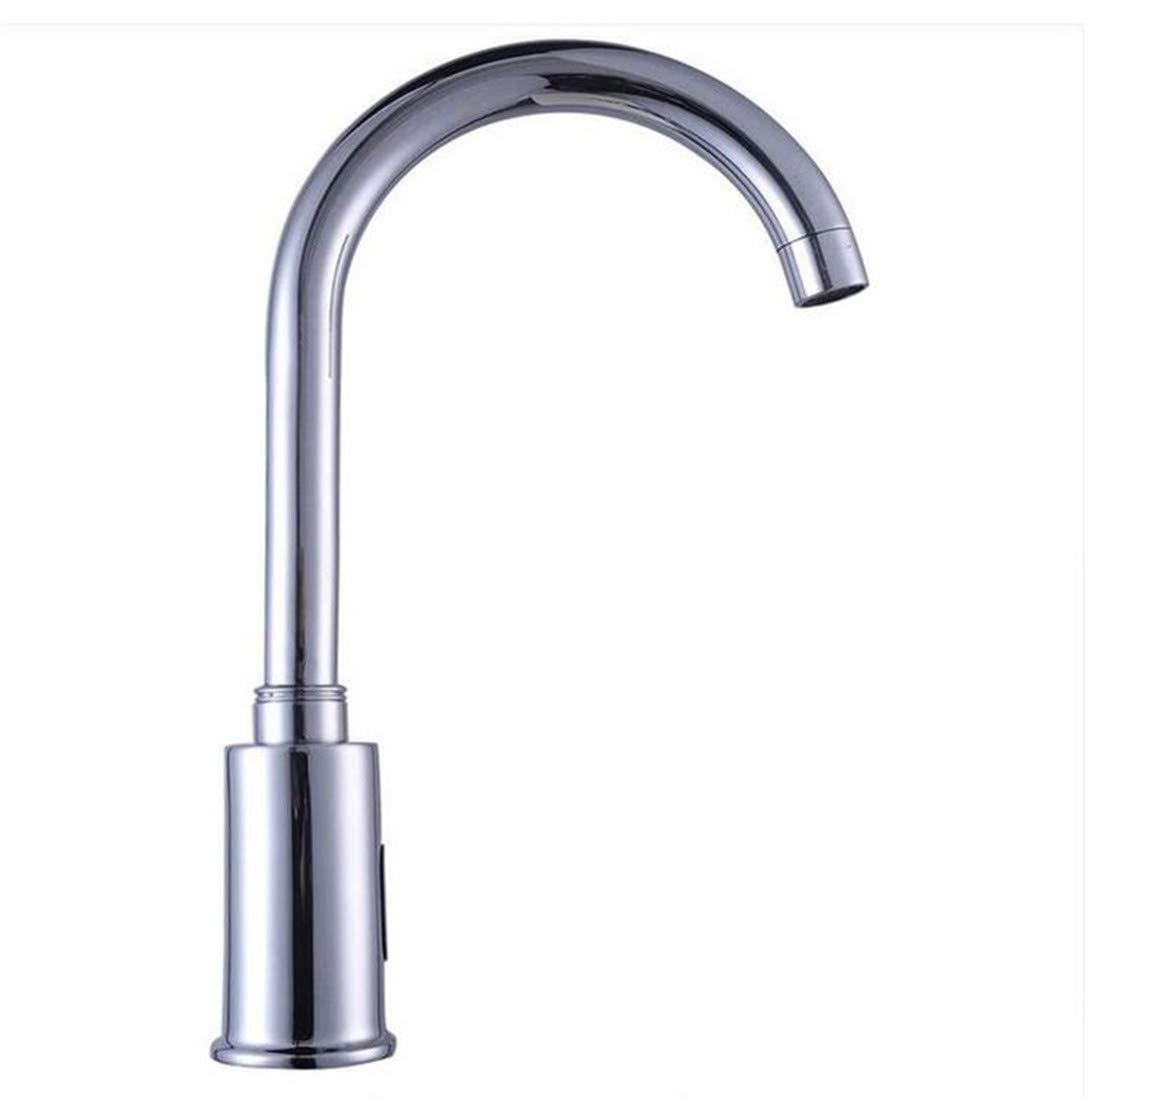 Vintage Messing 360 Grad Rotationautomatic Sensor Tap Infrarot Sensor Wassereinsparung Wasserhahn Induktive Küche Badezimmer